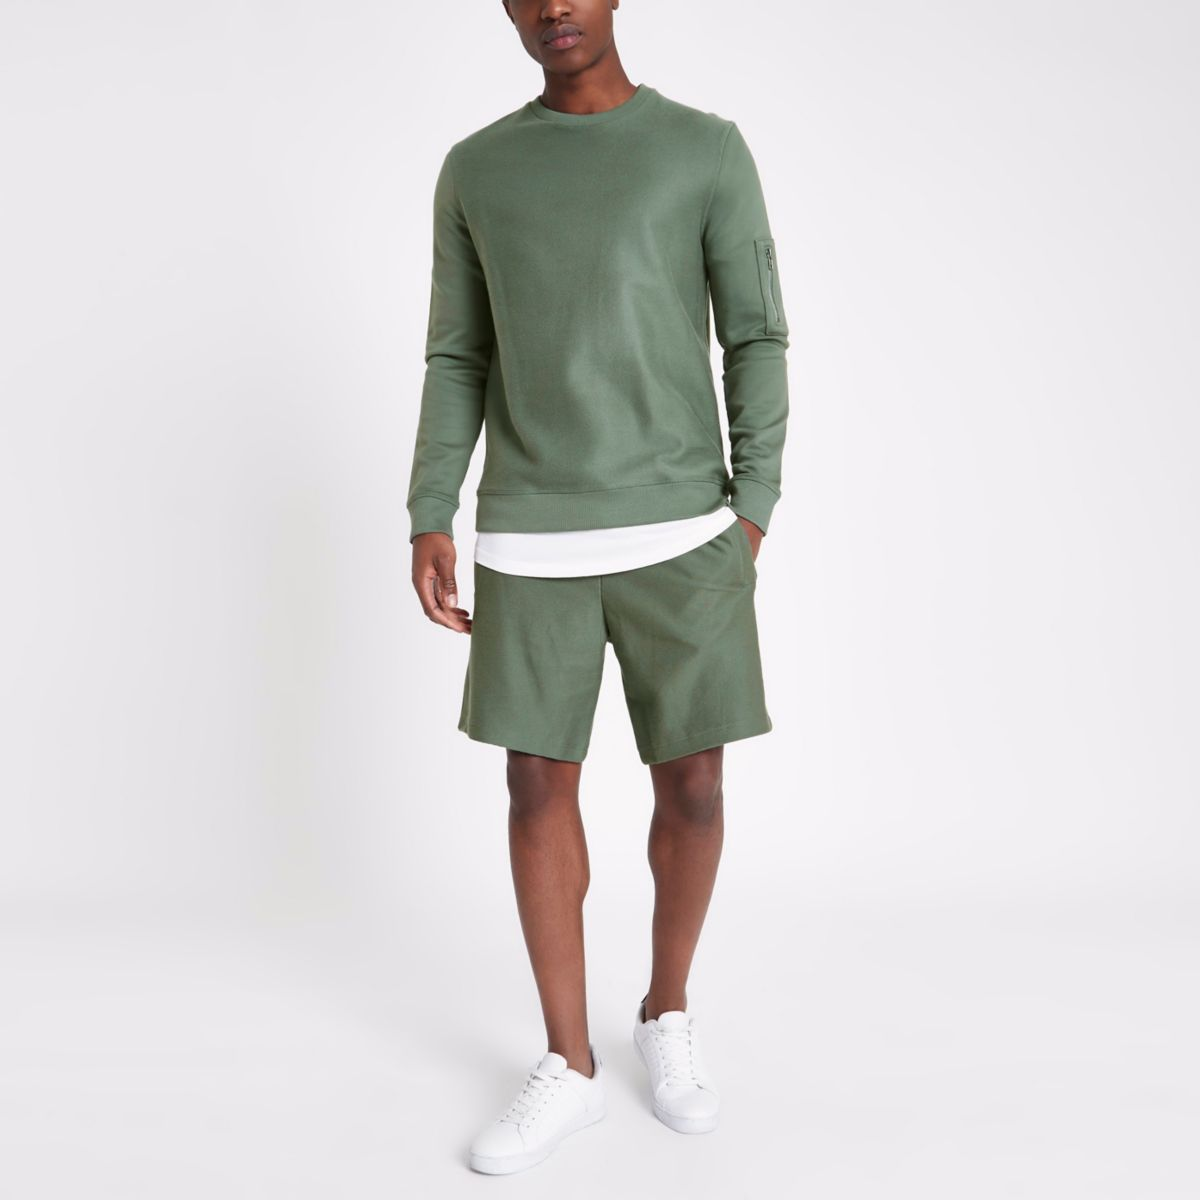 Khaki green twill shorts